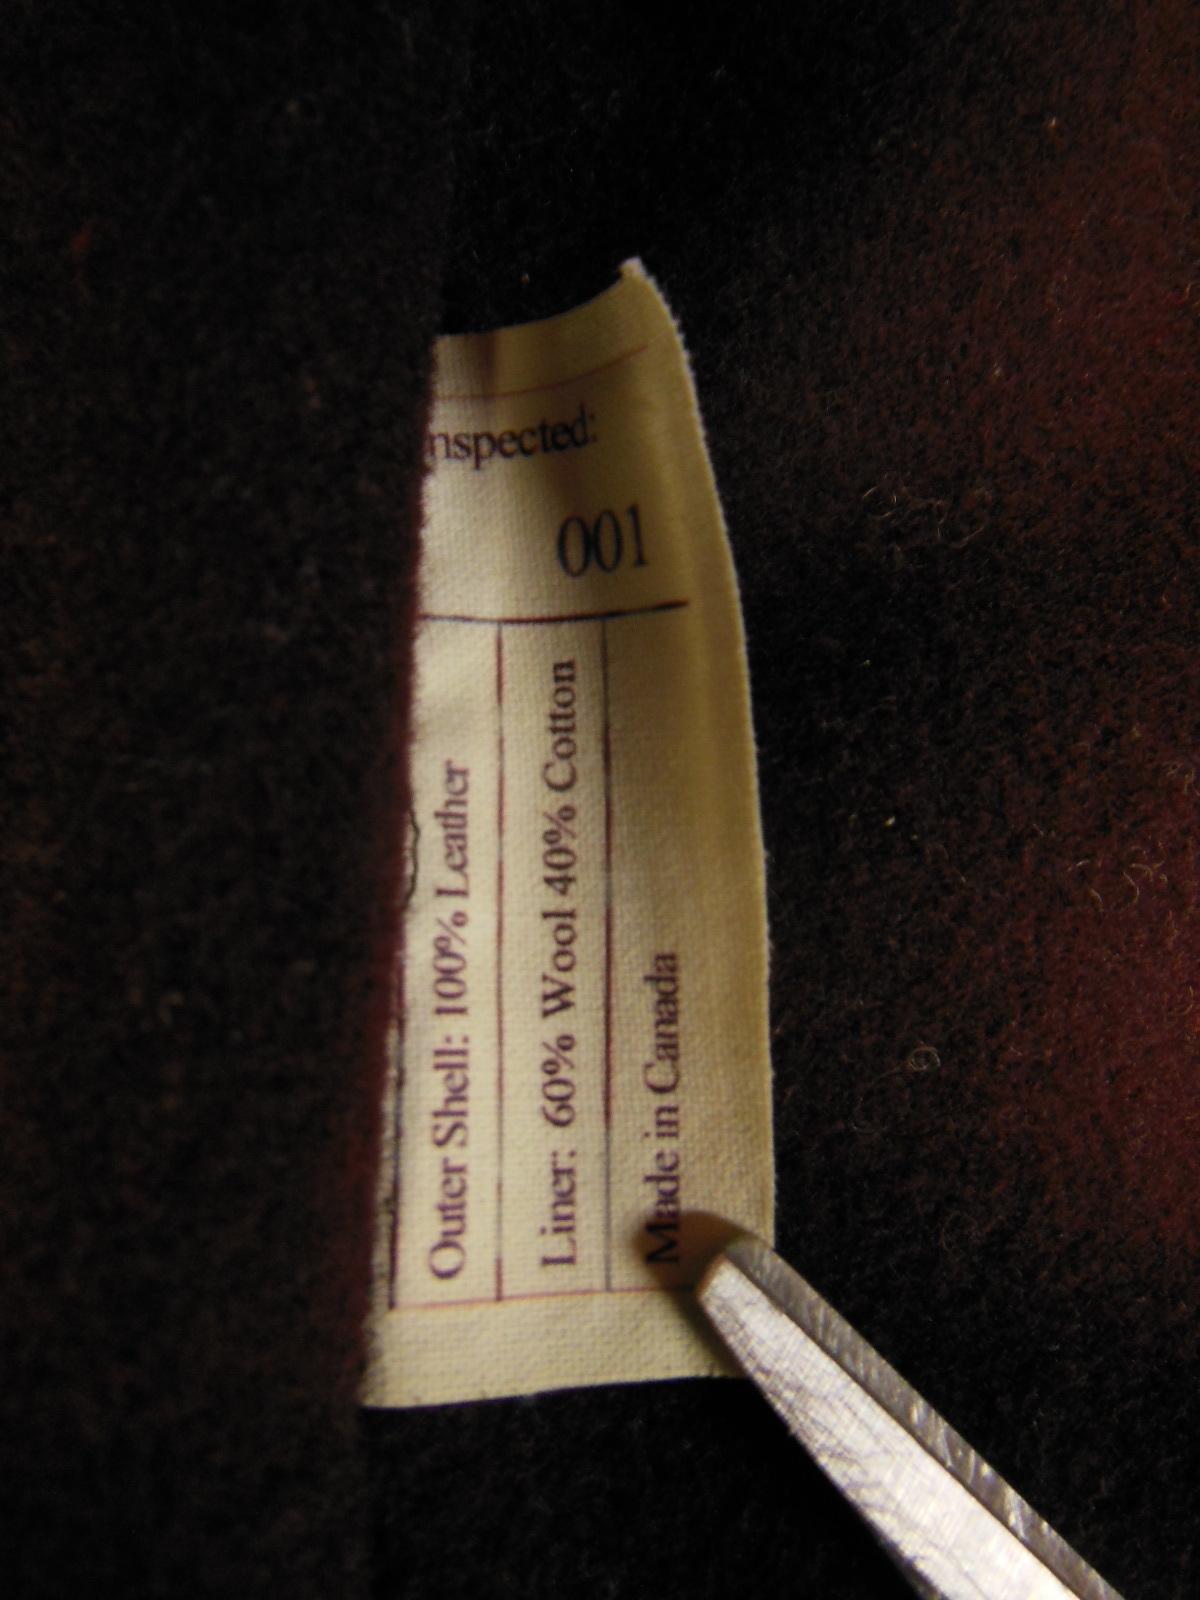 USED HIMEL BROTHERS LEATHER HERON 1929/新喜皮革製黒ホースハイド/SIZE-36/ボタンフロント A-1 ジャケット_c0187684_15041844.jpg